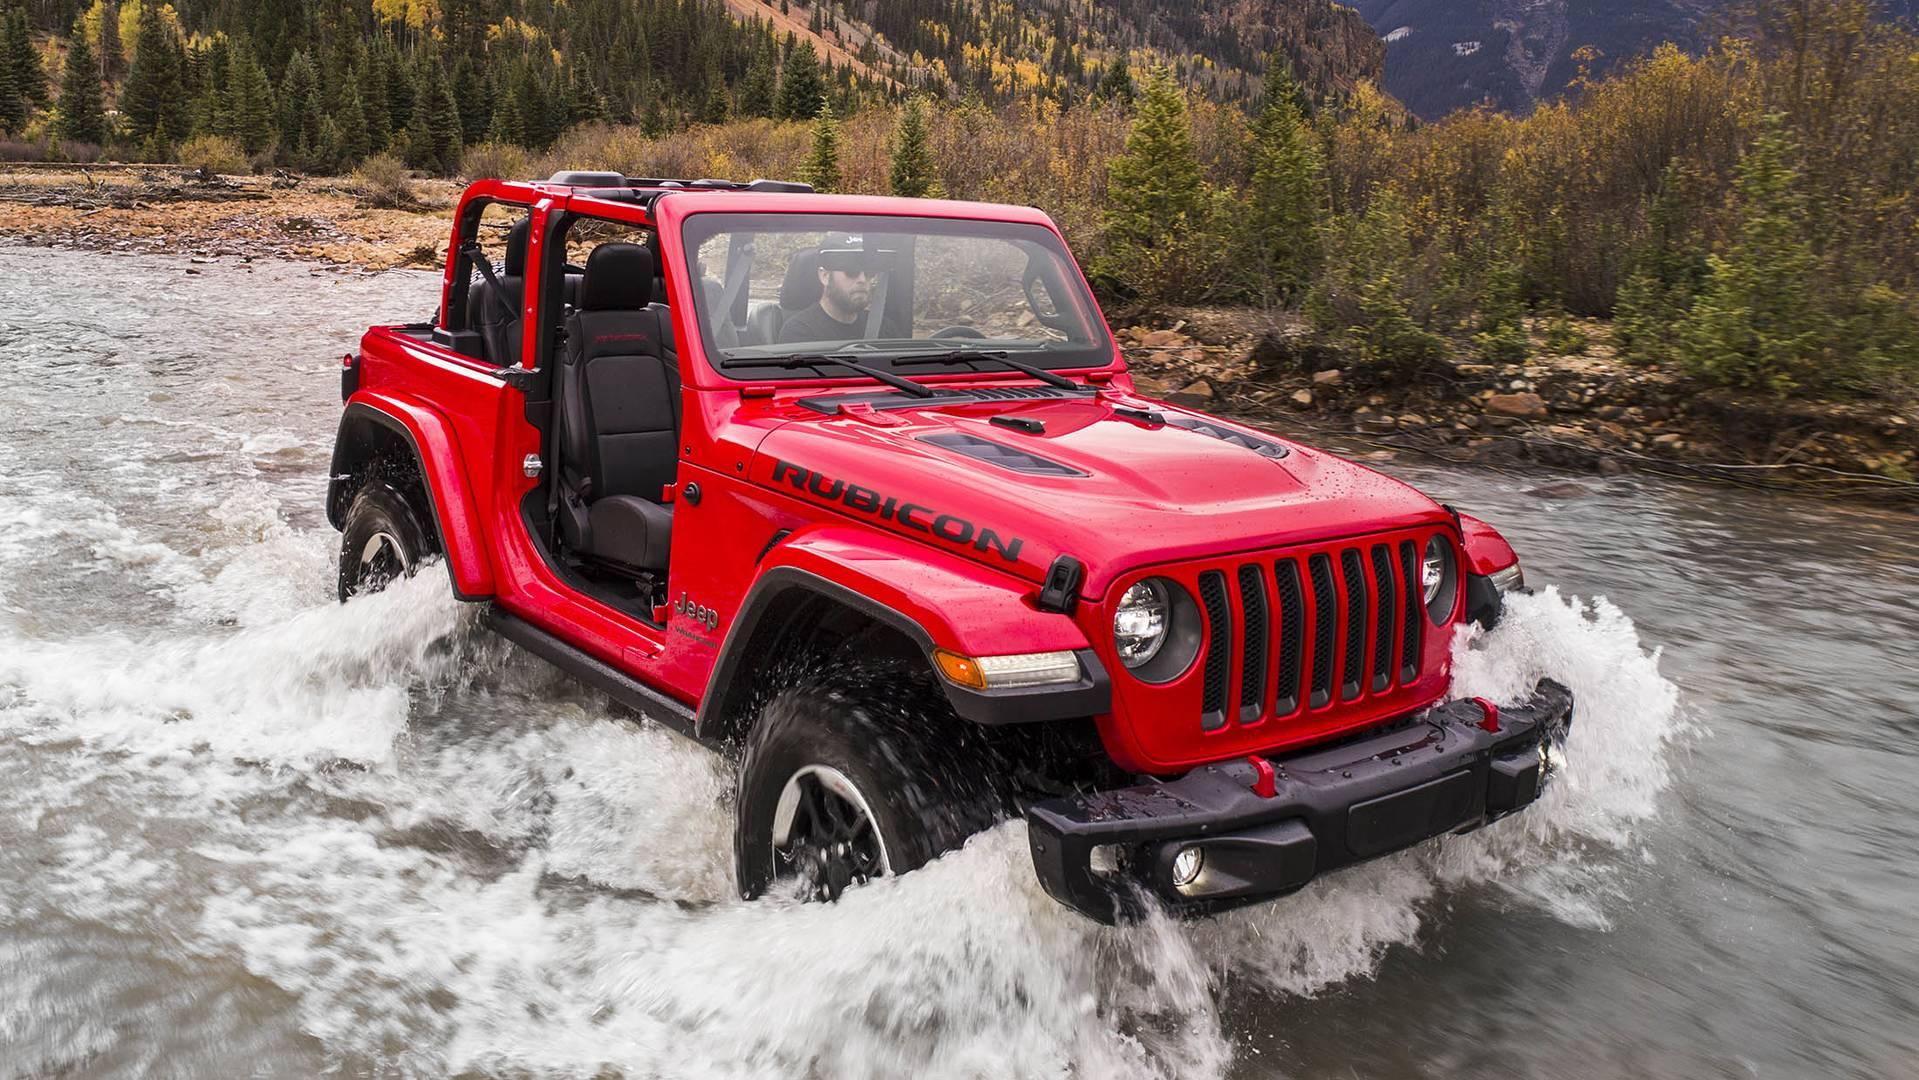 2020 Jeep Wrangler: News, Diesel, PHEV, Price >> 2020 Jeep Wrangler Gets Ecodiesel V6 Engine Etorque Mild